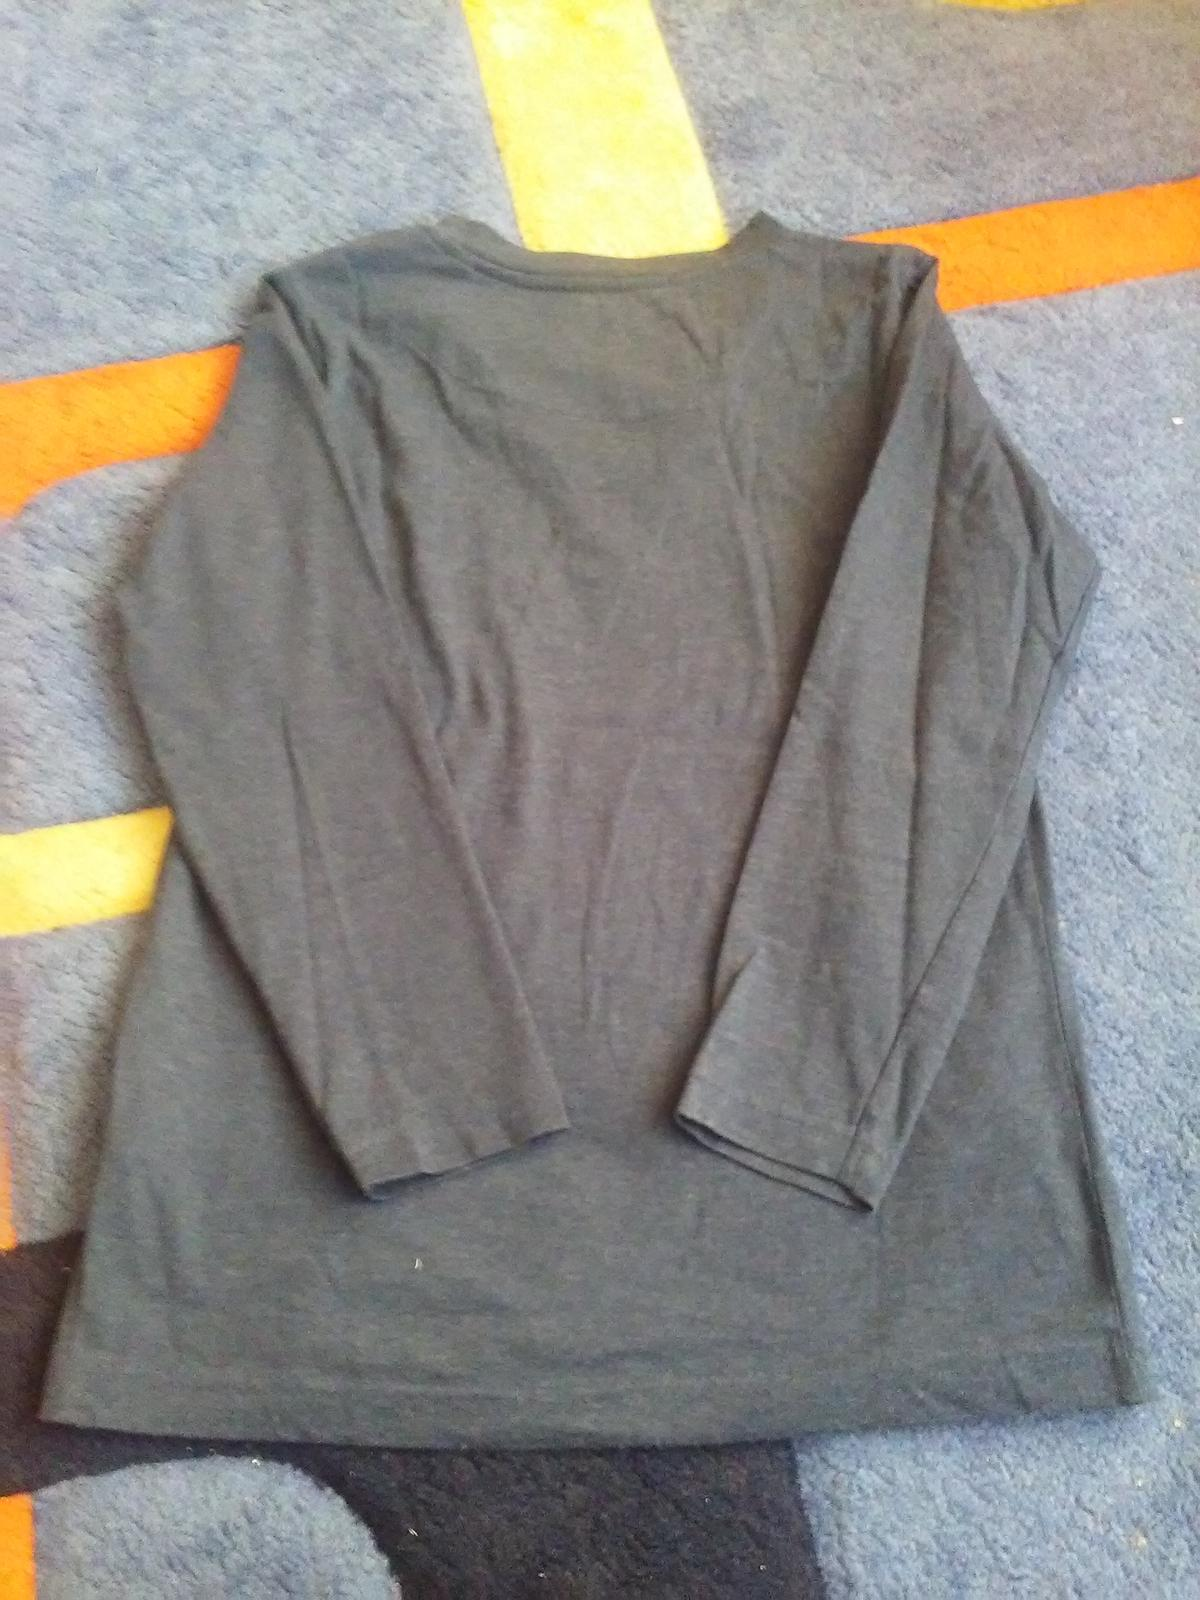 Tmavomodré elegantné tričko - Obrázok č. 1